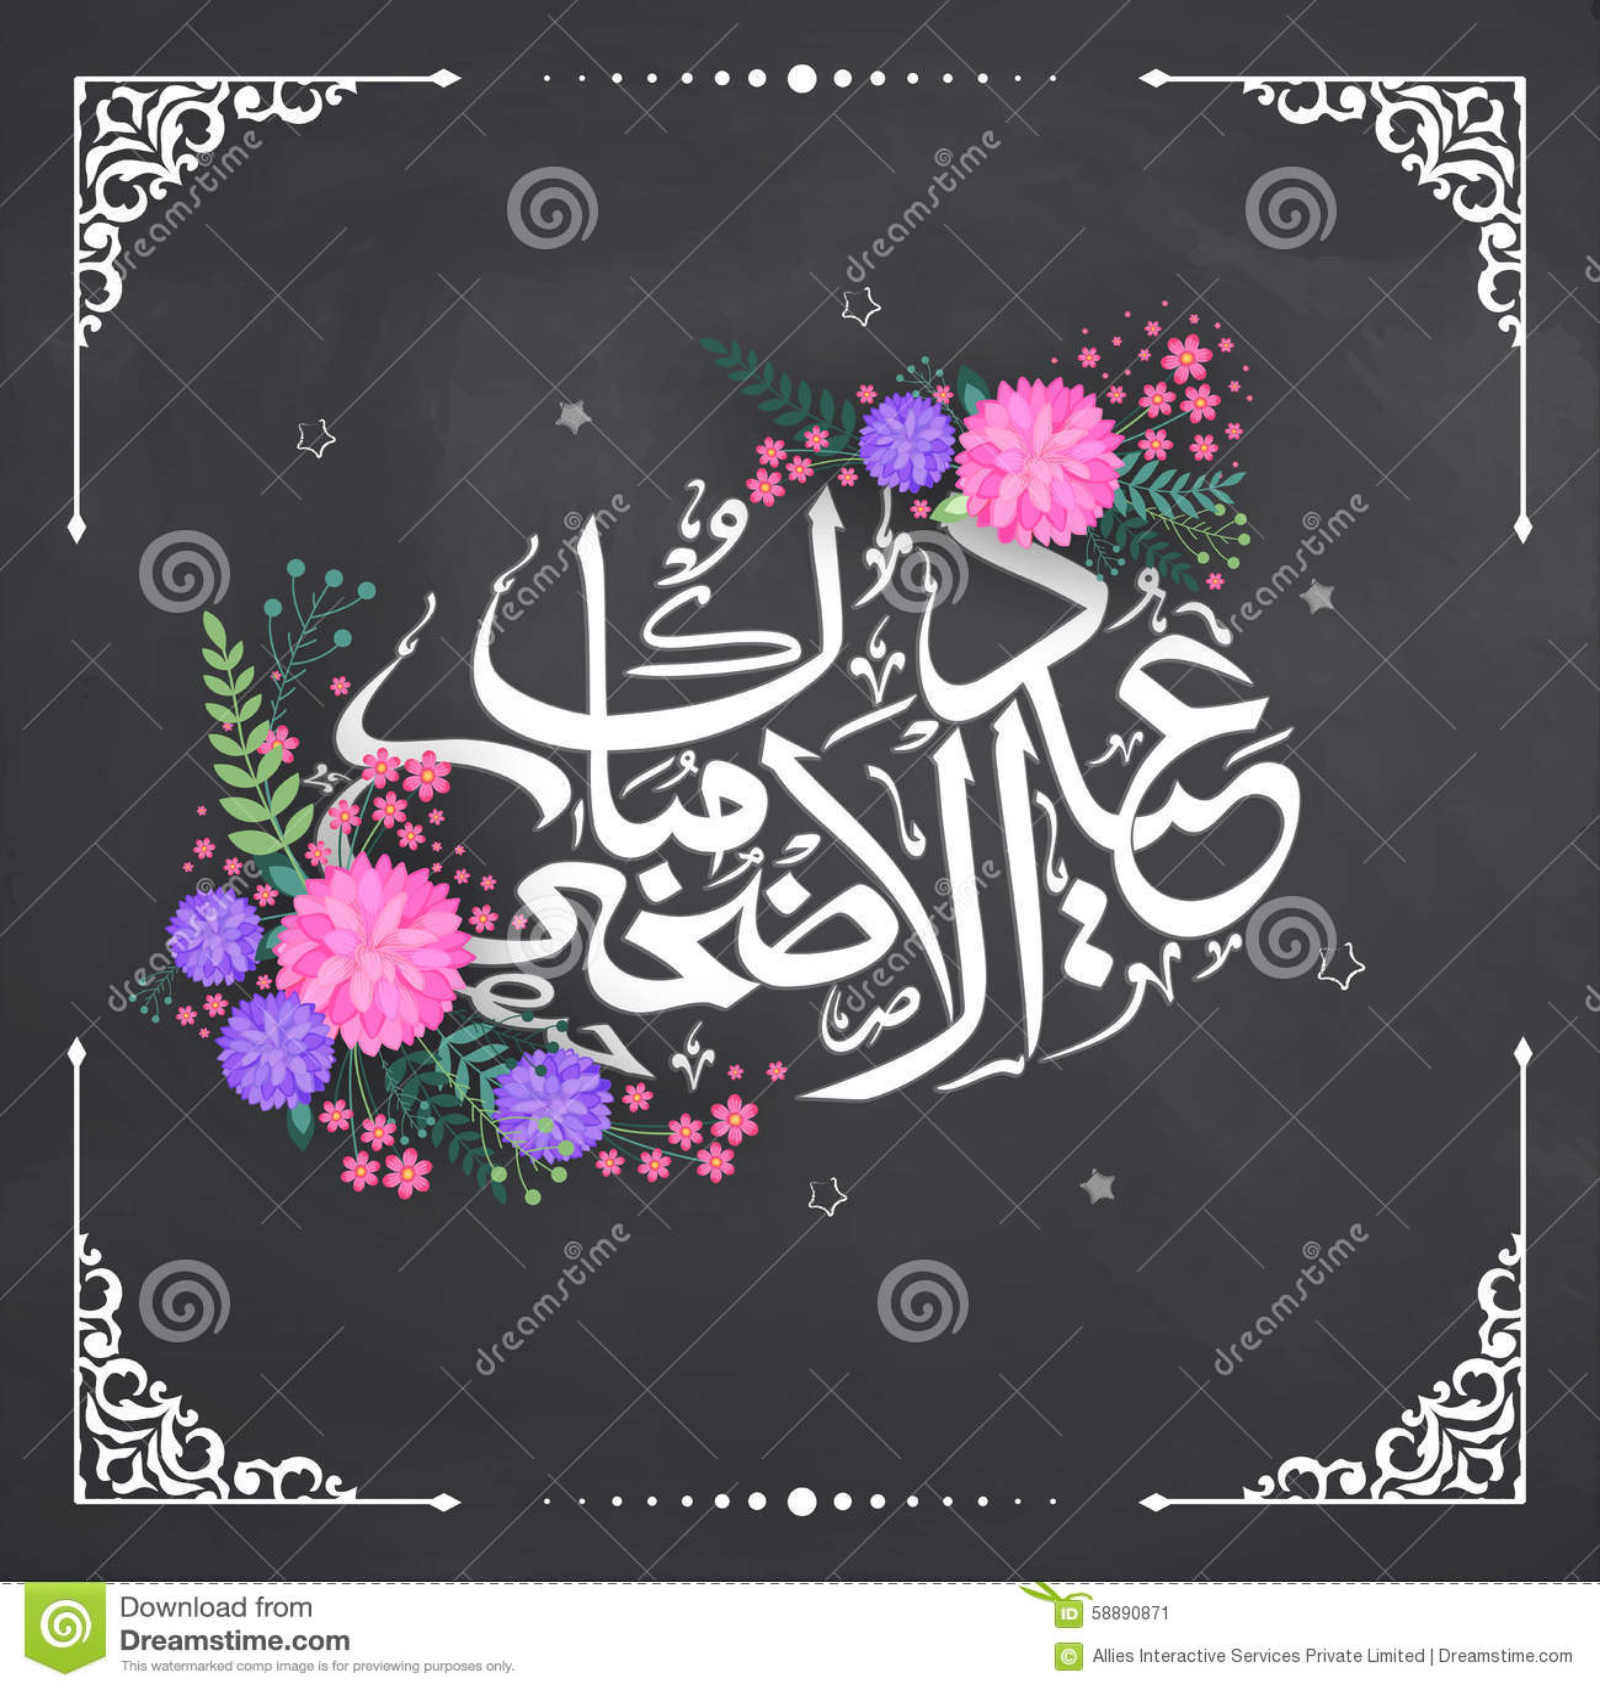 Greeting card for eid al adha celebration stock image image of greeting card for eid al adha celebration kristyandbryce Images